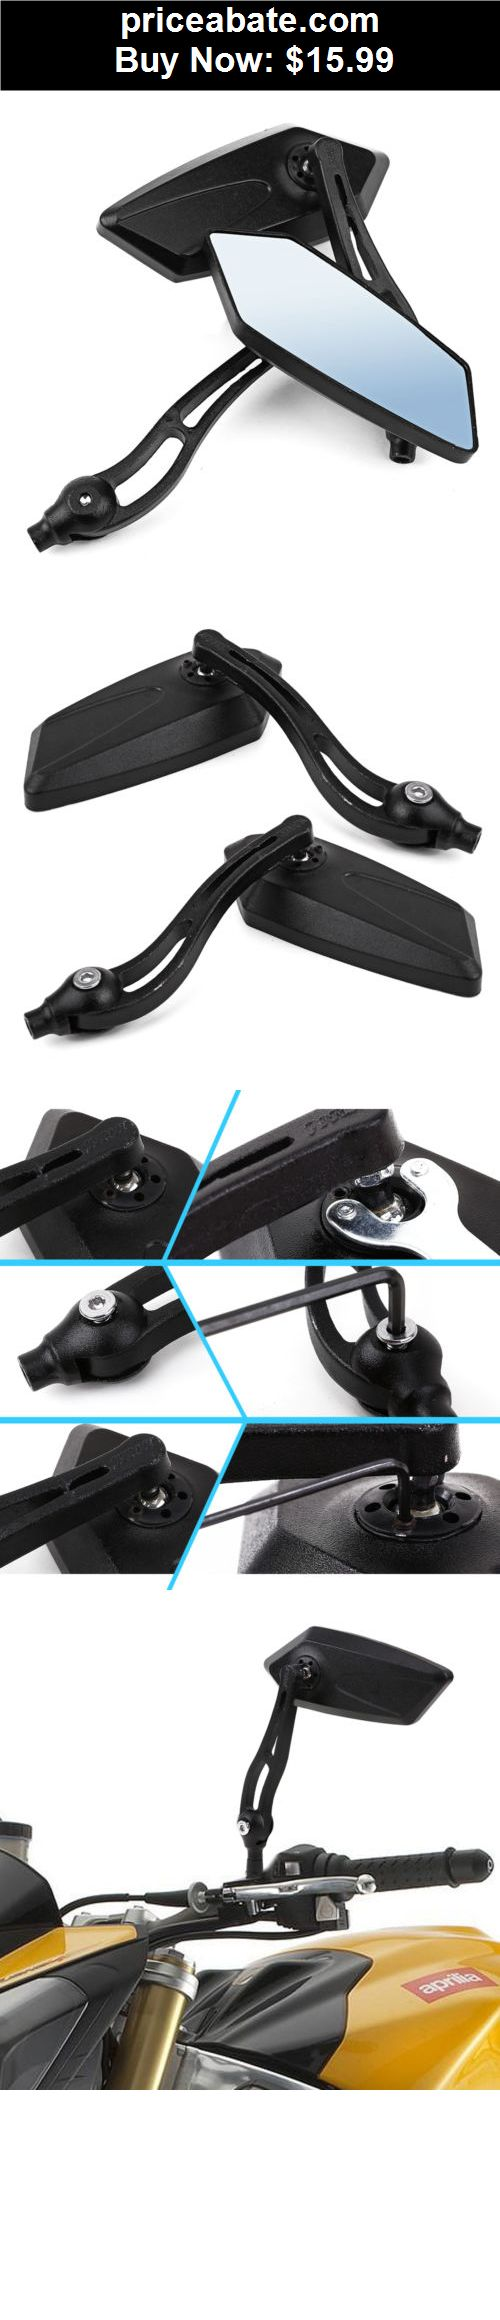 Motors parts and accessories black custom side mirrors motorcycle street sport bike